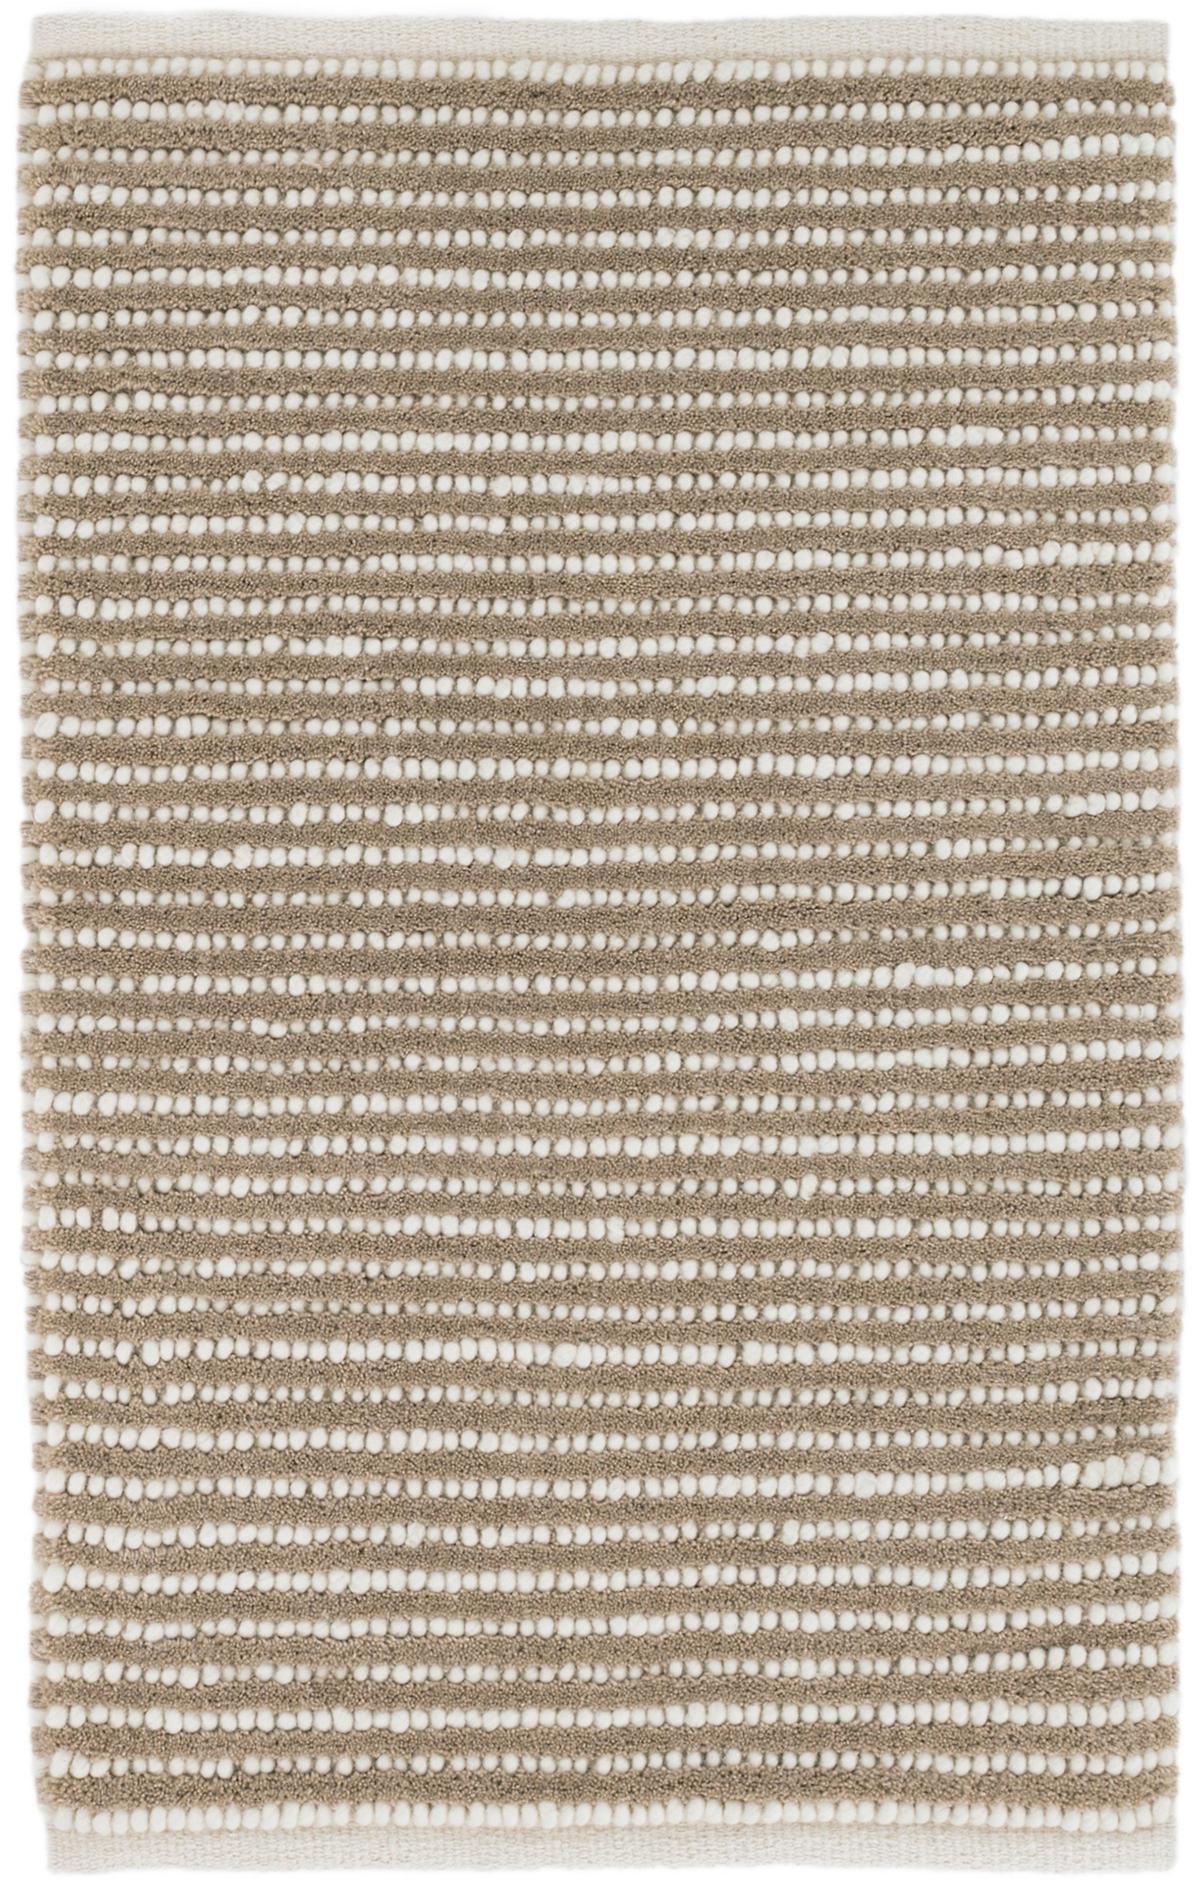 Brushed Stripe Mocha Woven Wool Rug